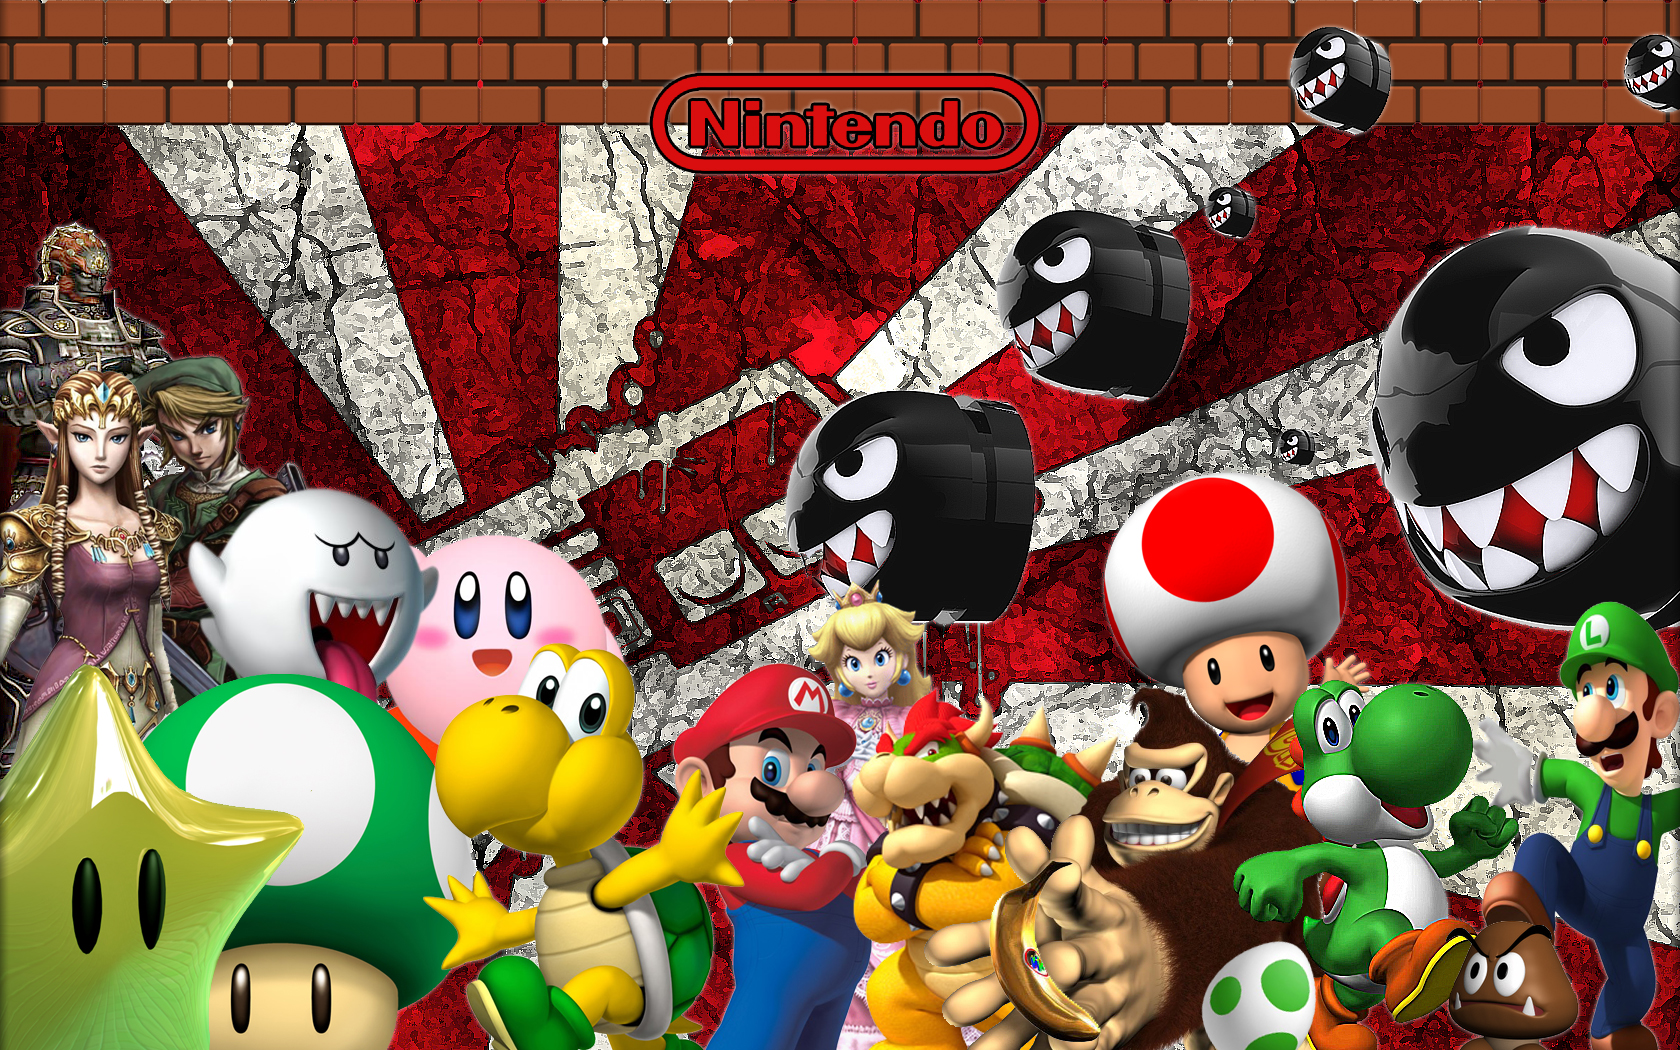 45 Nintendo Hd Wallpapers On Wallpapersafari